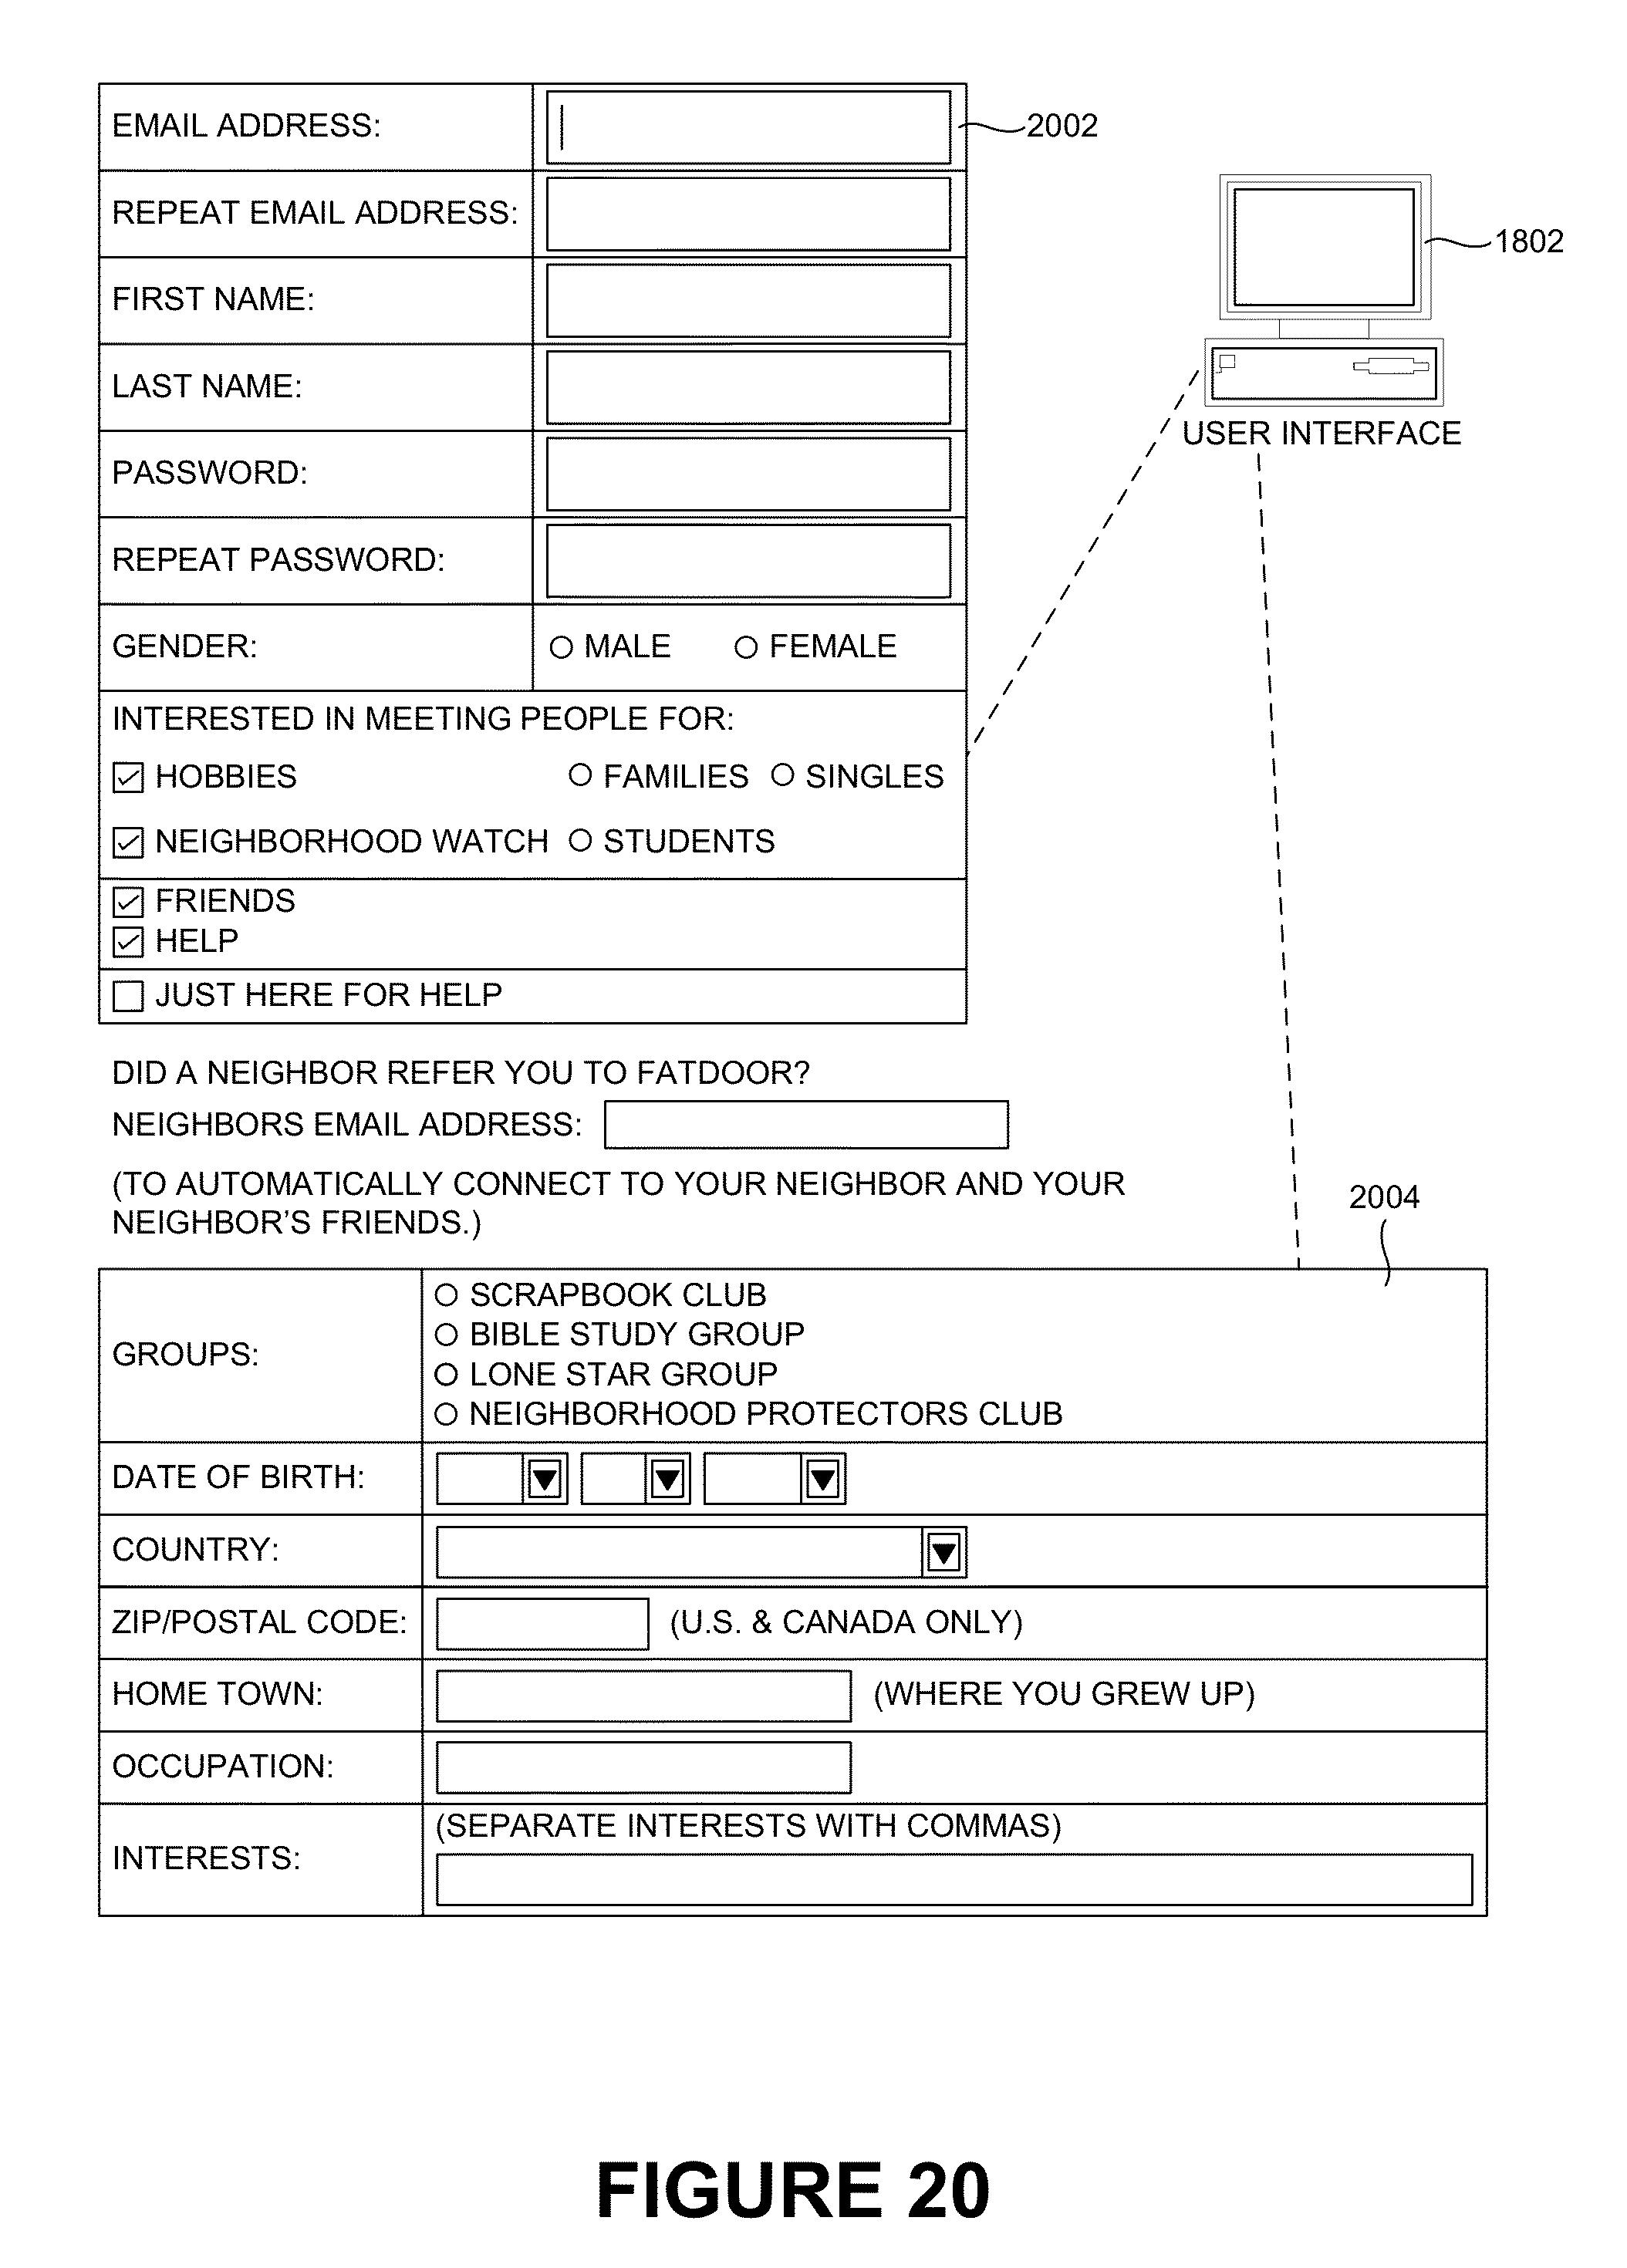 Patent US 9,037,516 B2